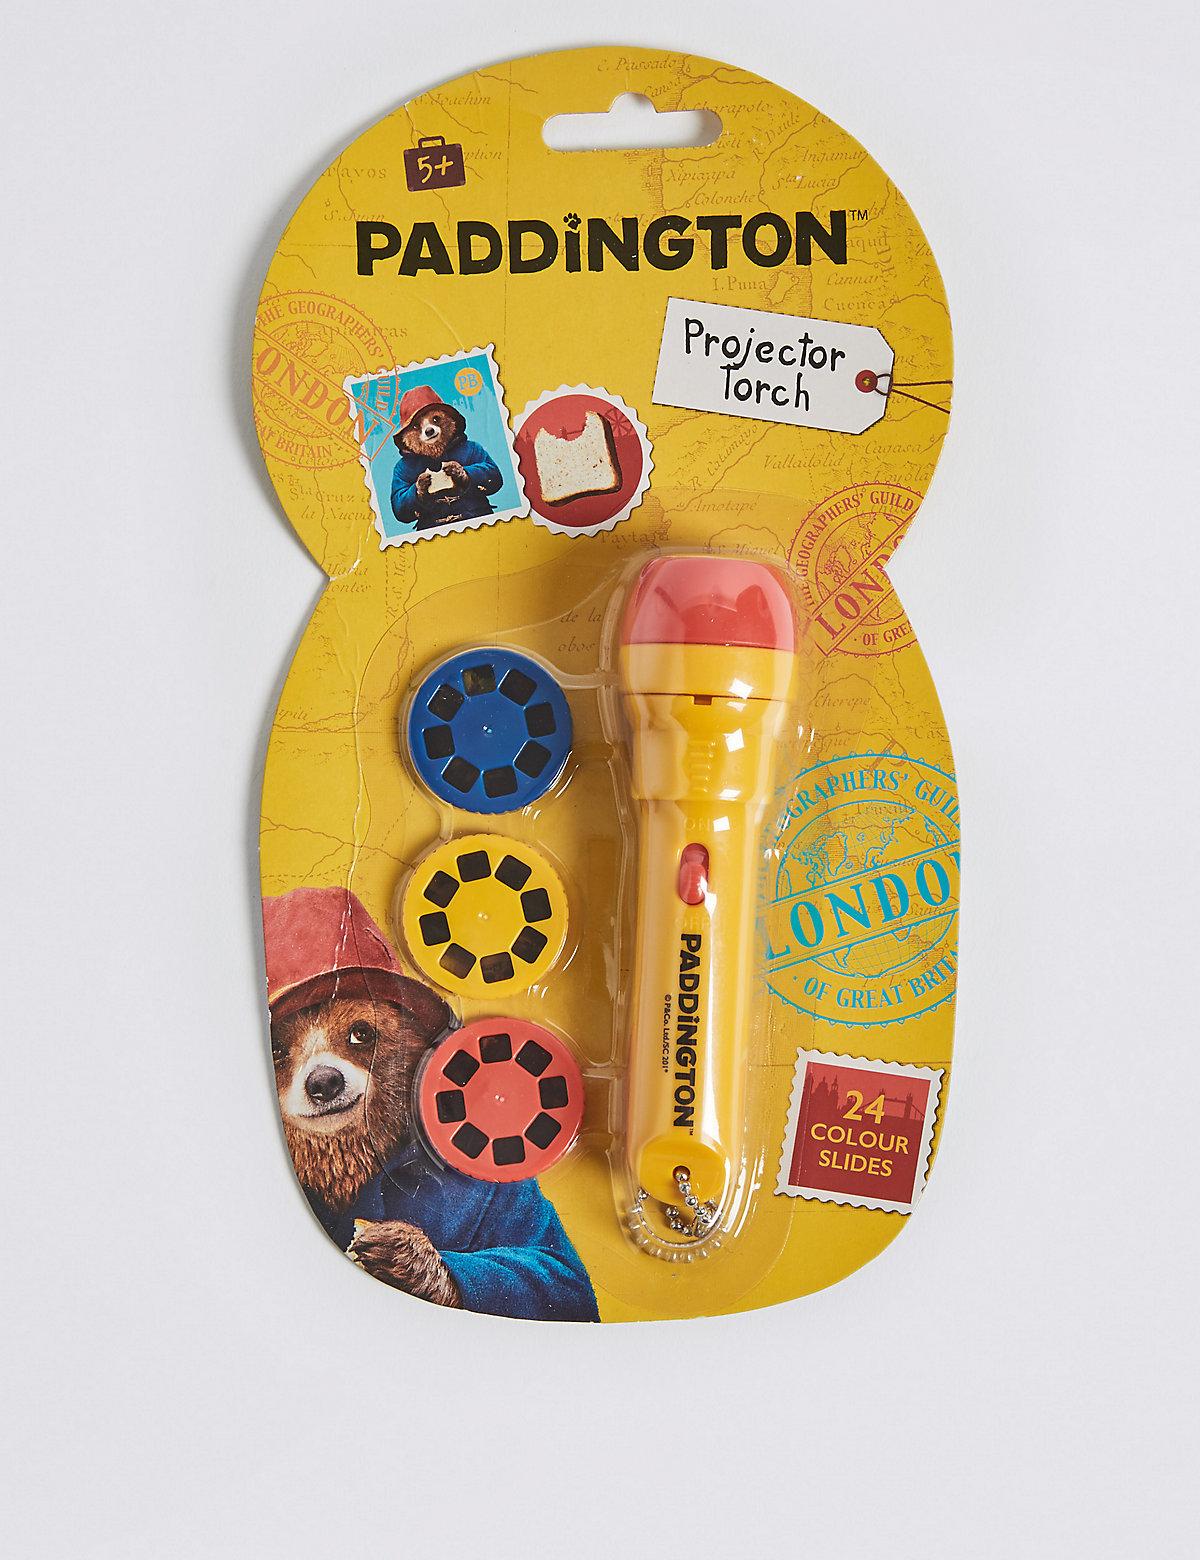 Paddington Projector Torch